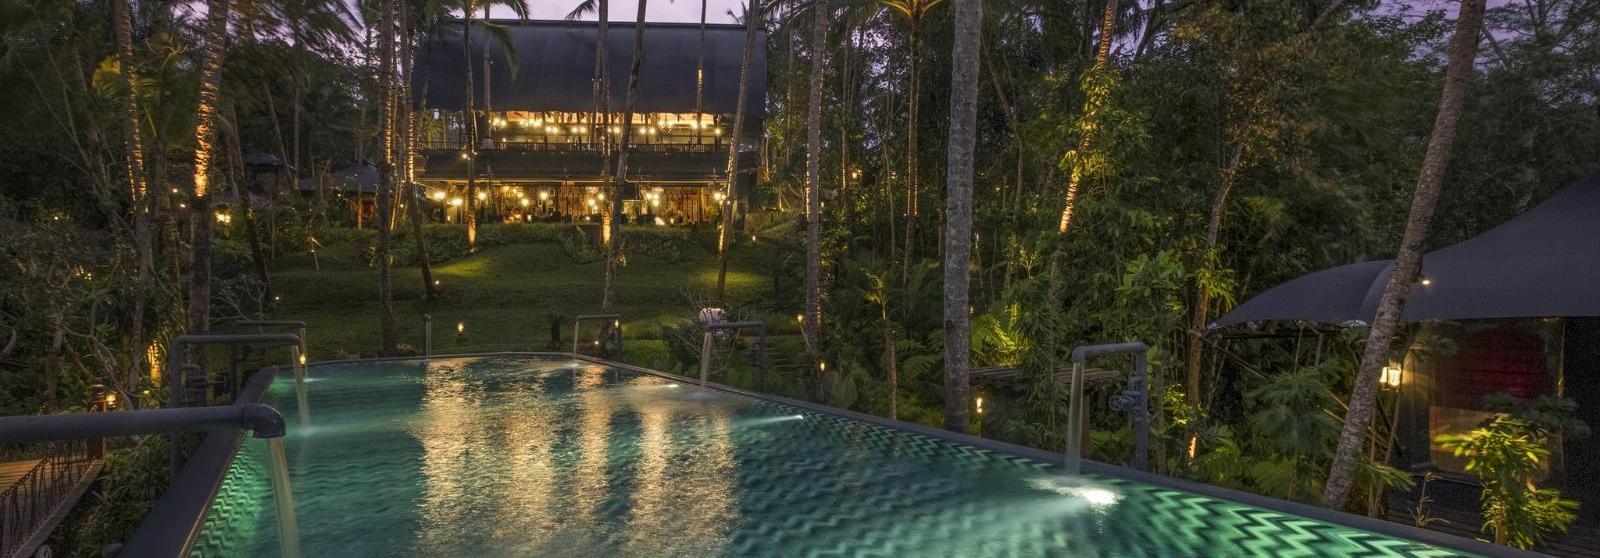 乌布嘉佩乐酒店(Capella Ubud) 图片  www.lhw.cn